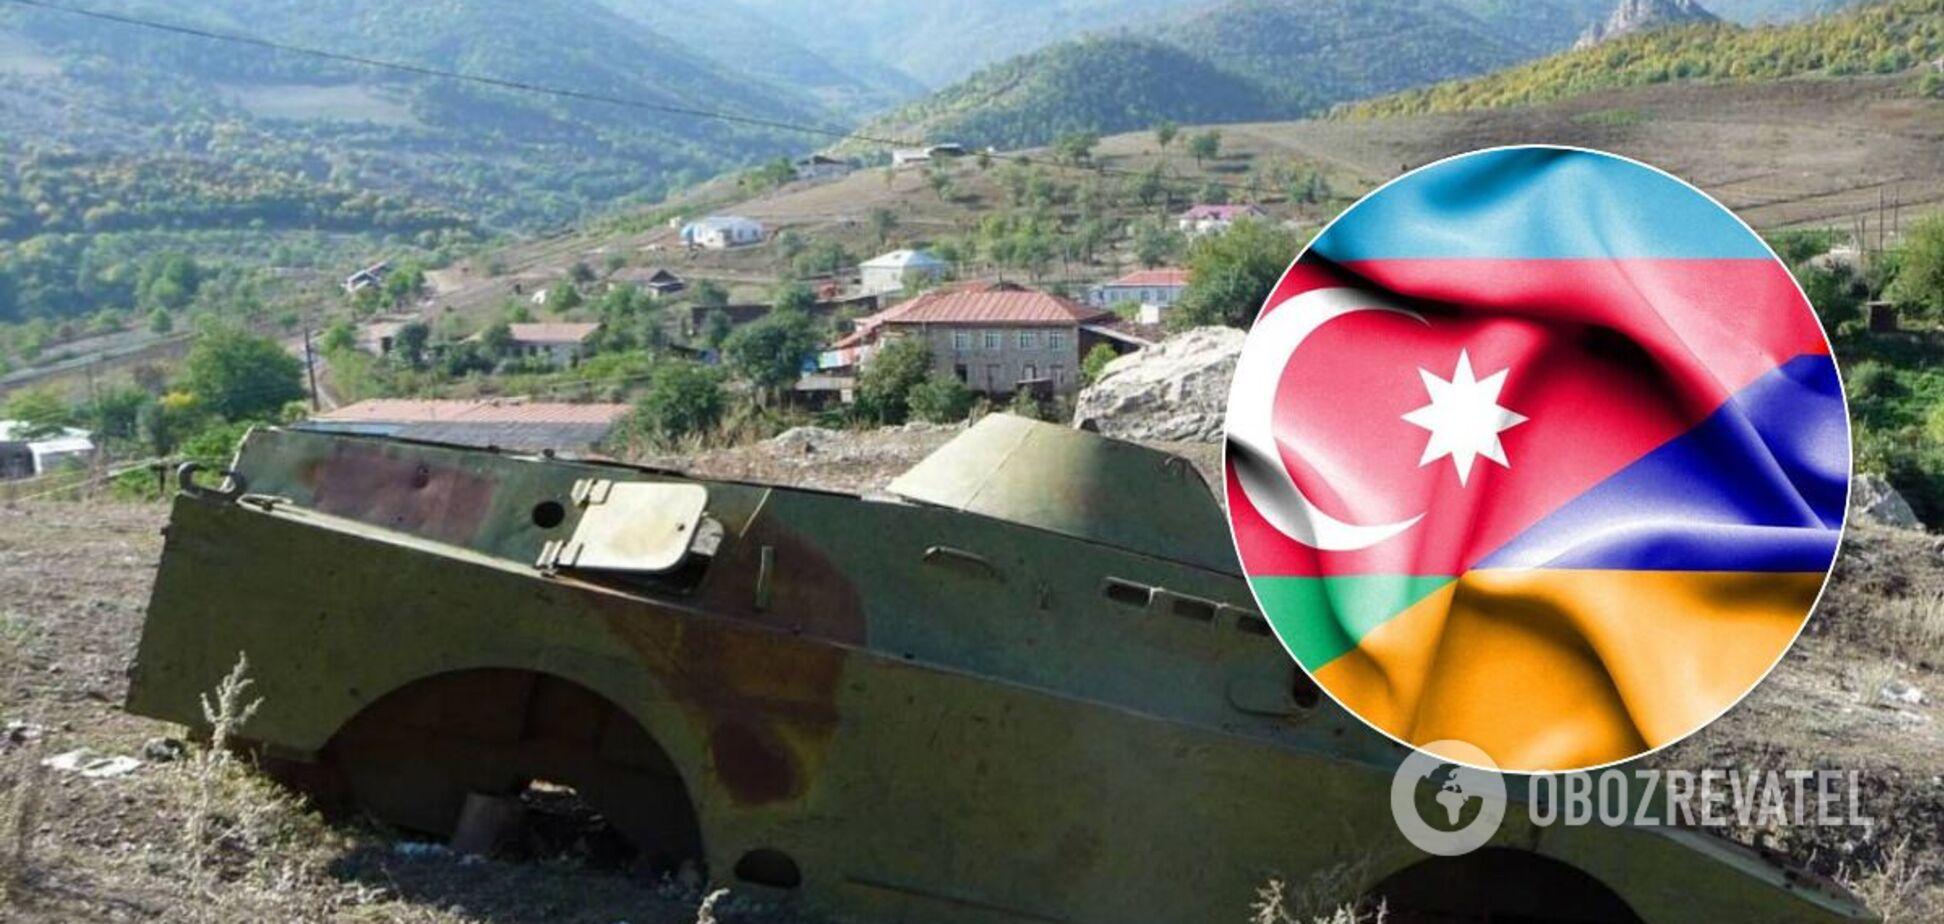 Конфликт между Арменией и Азербайджаном